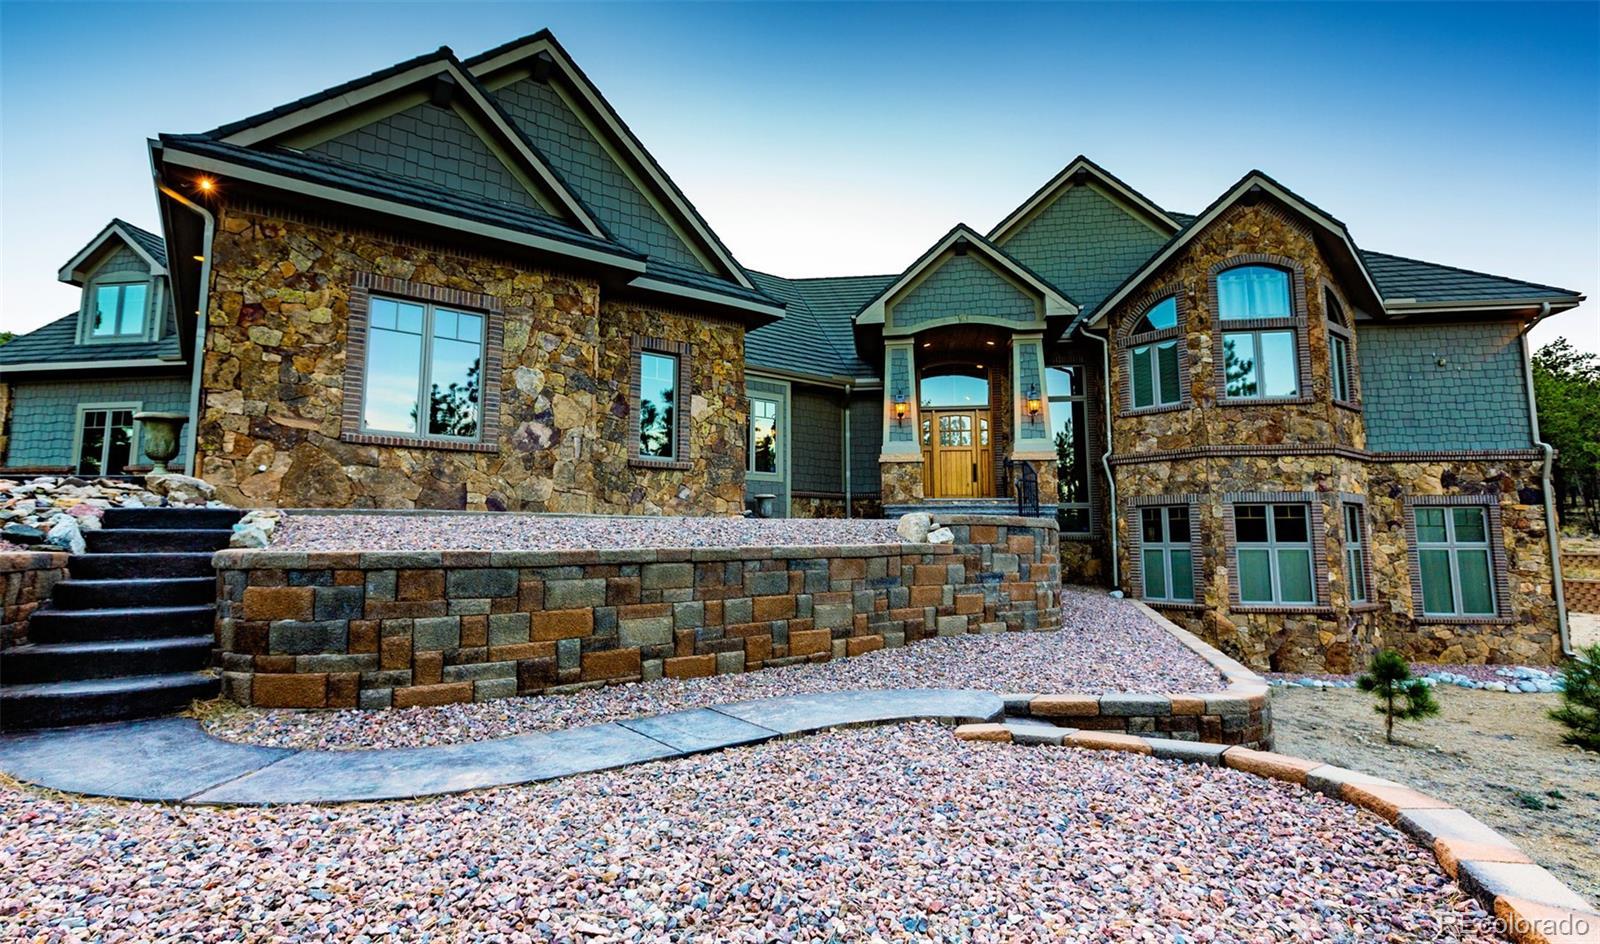 16393 County Road 325 Property Photo - Buena Vista, CO real estate listing